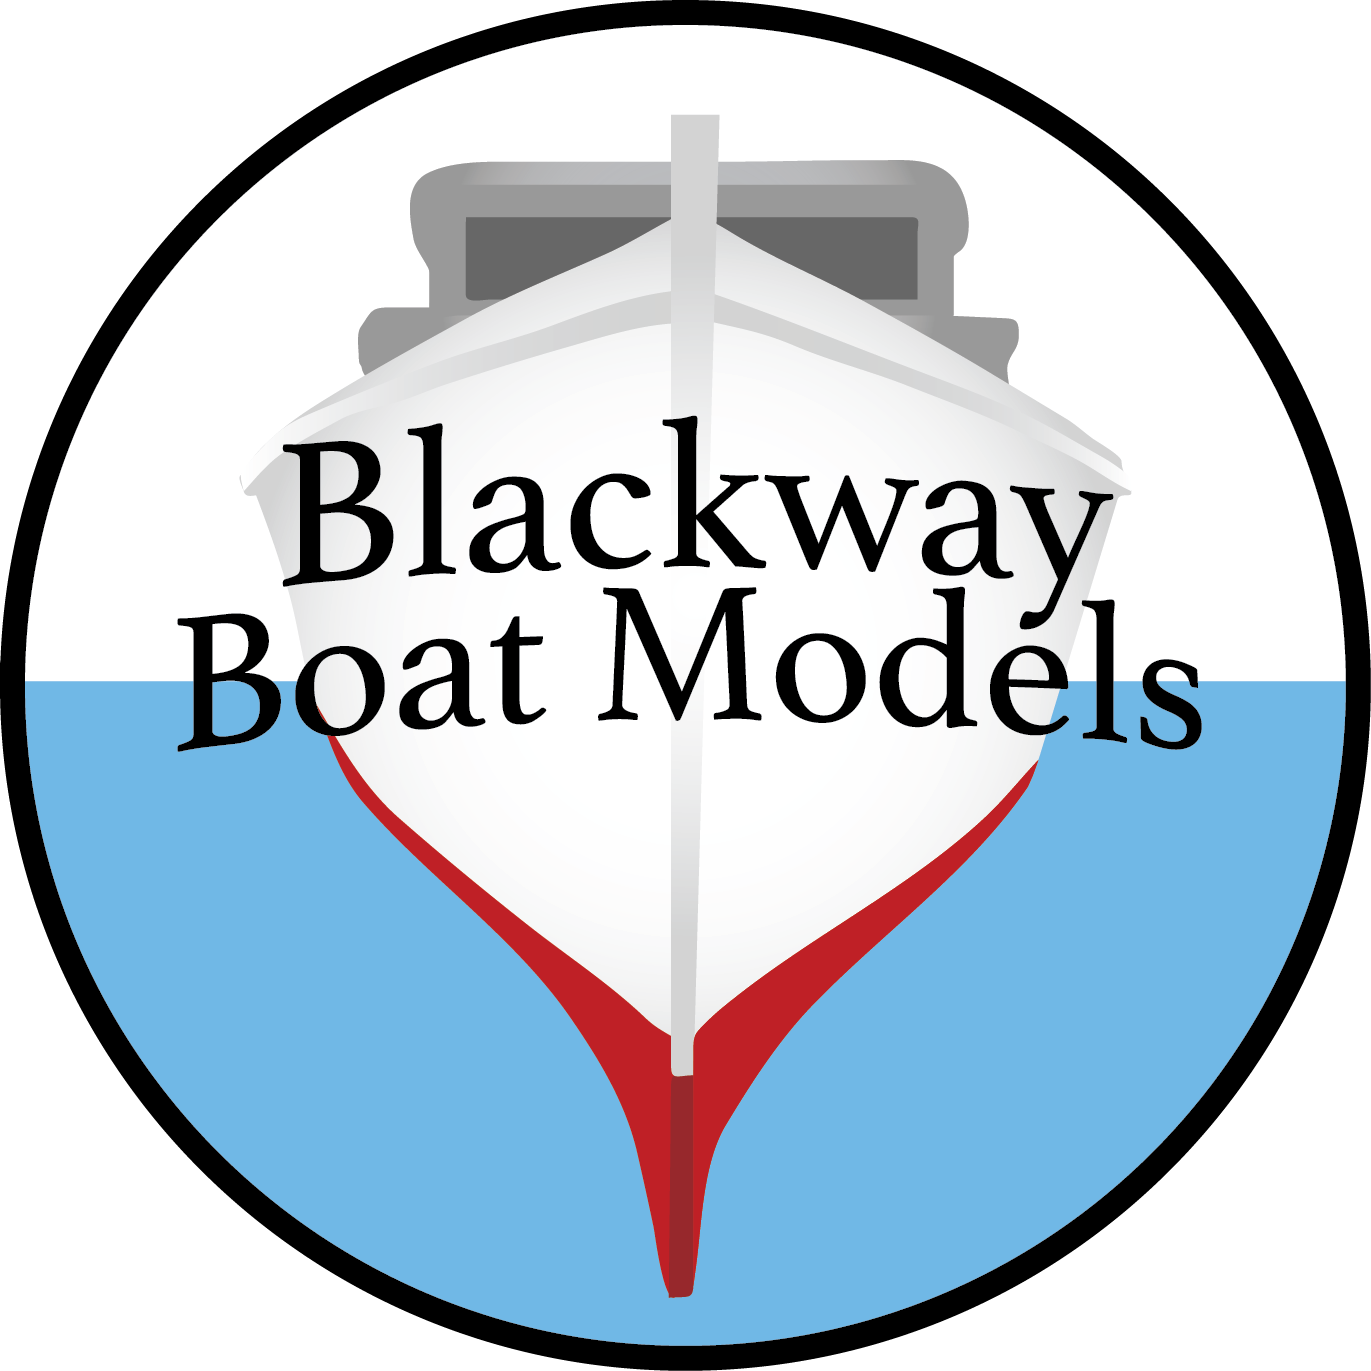 Crabs clipart crabbing. Shop accessories blackway boat